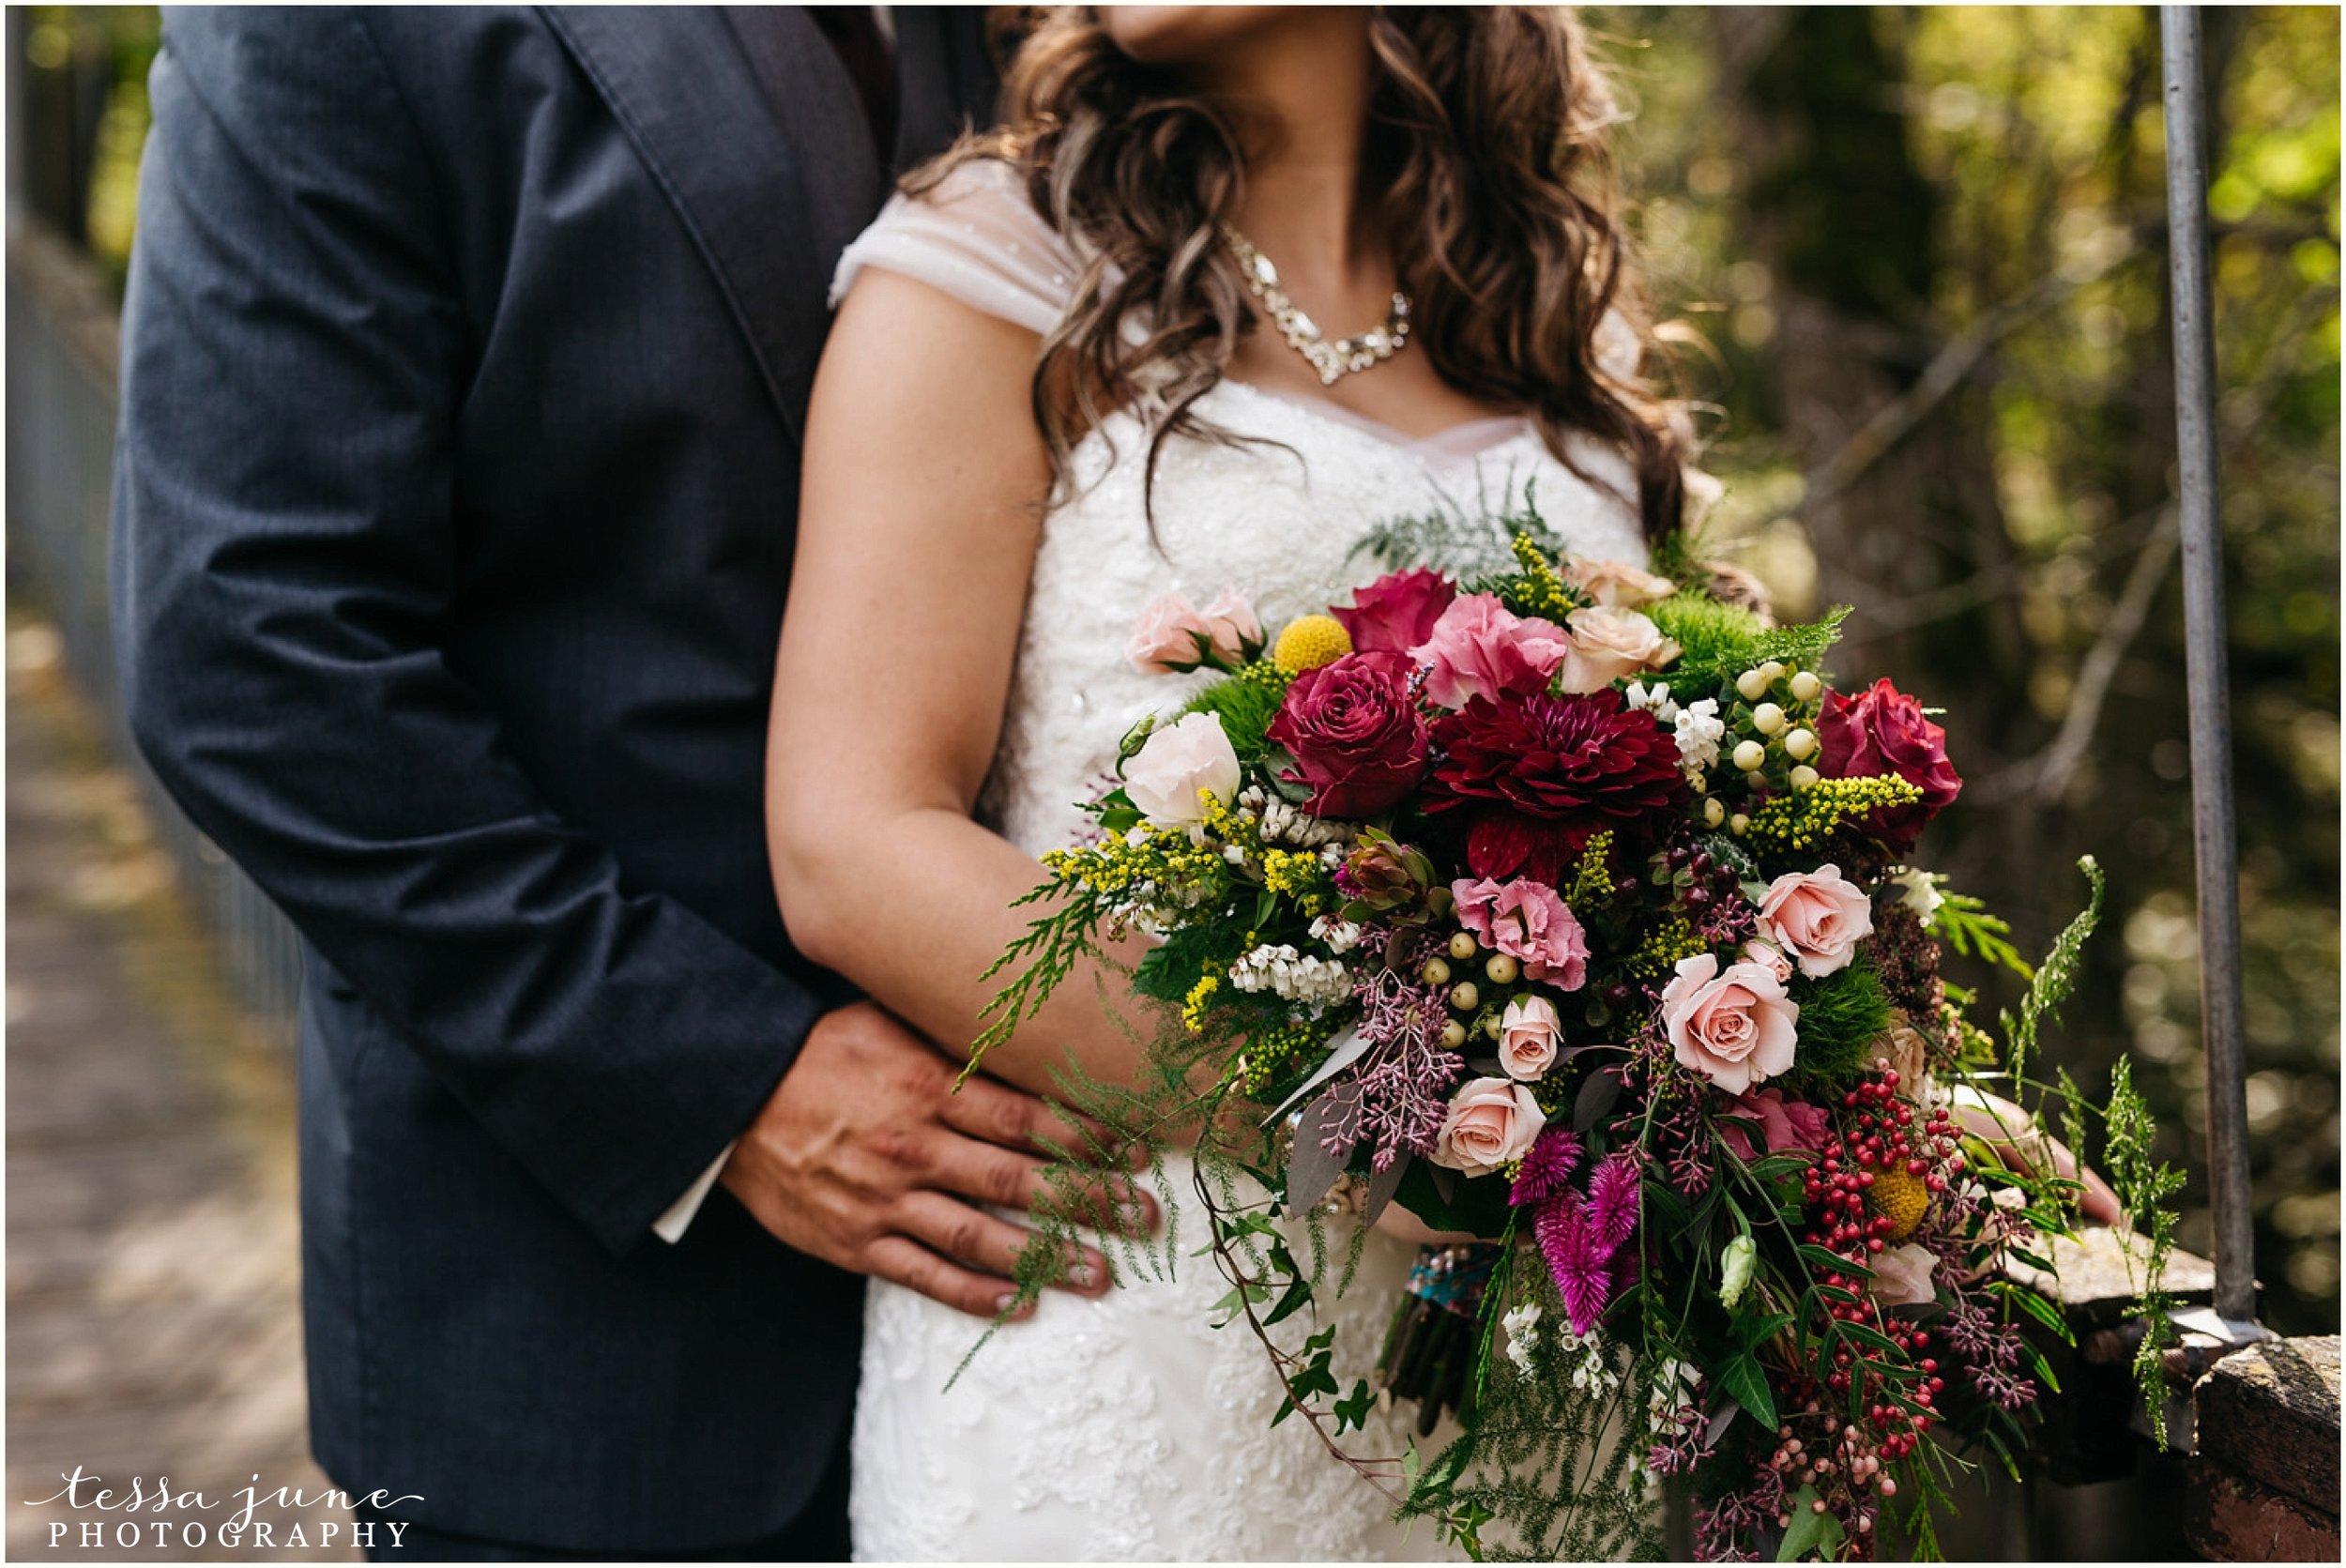 bohemian-minnesota-wedding-mismatched-bridesmaid-dresses-waterfall-st-cloud-tessa-june-photography-42.jpg